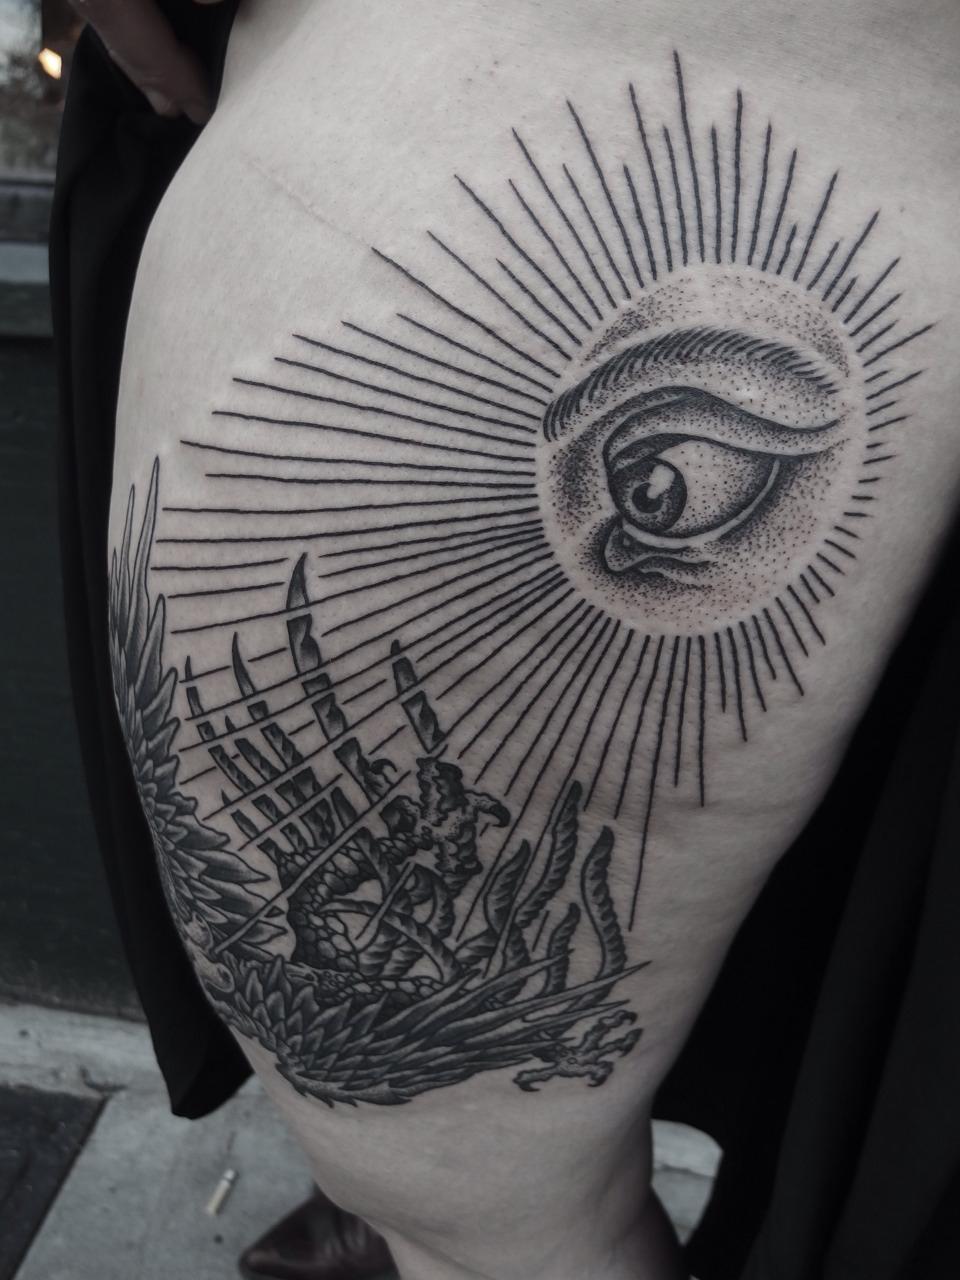 53edd301b8044rafael_delalande-200514-sqm-tattoo-026.jpg